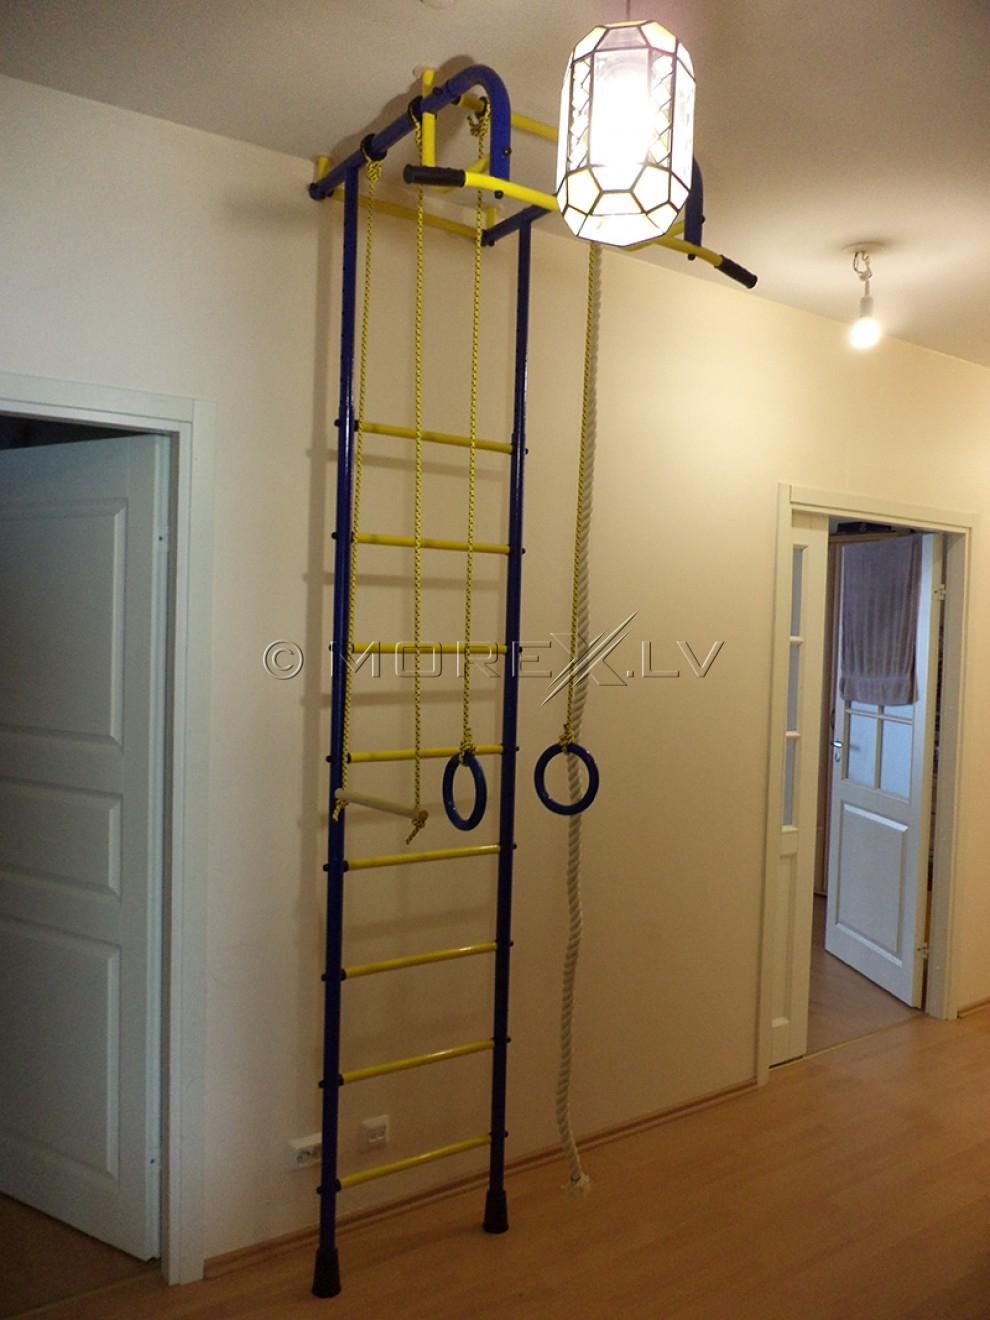 Laste rootsi sein Pioner-1 blue-yellow (swedish wall)